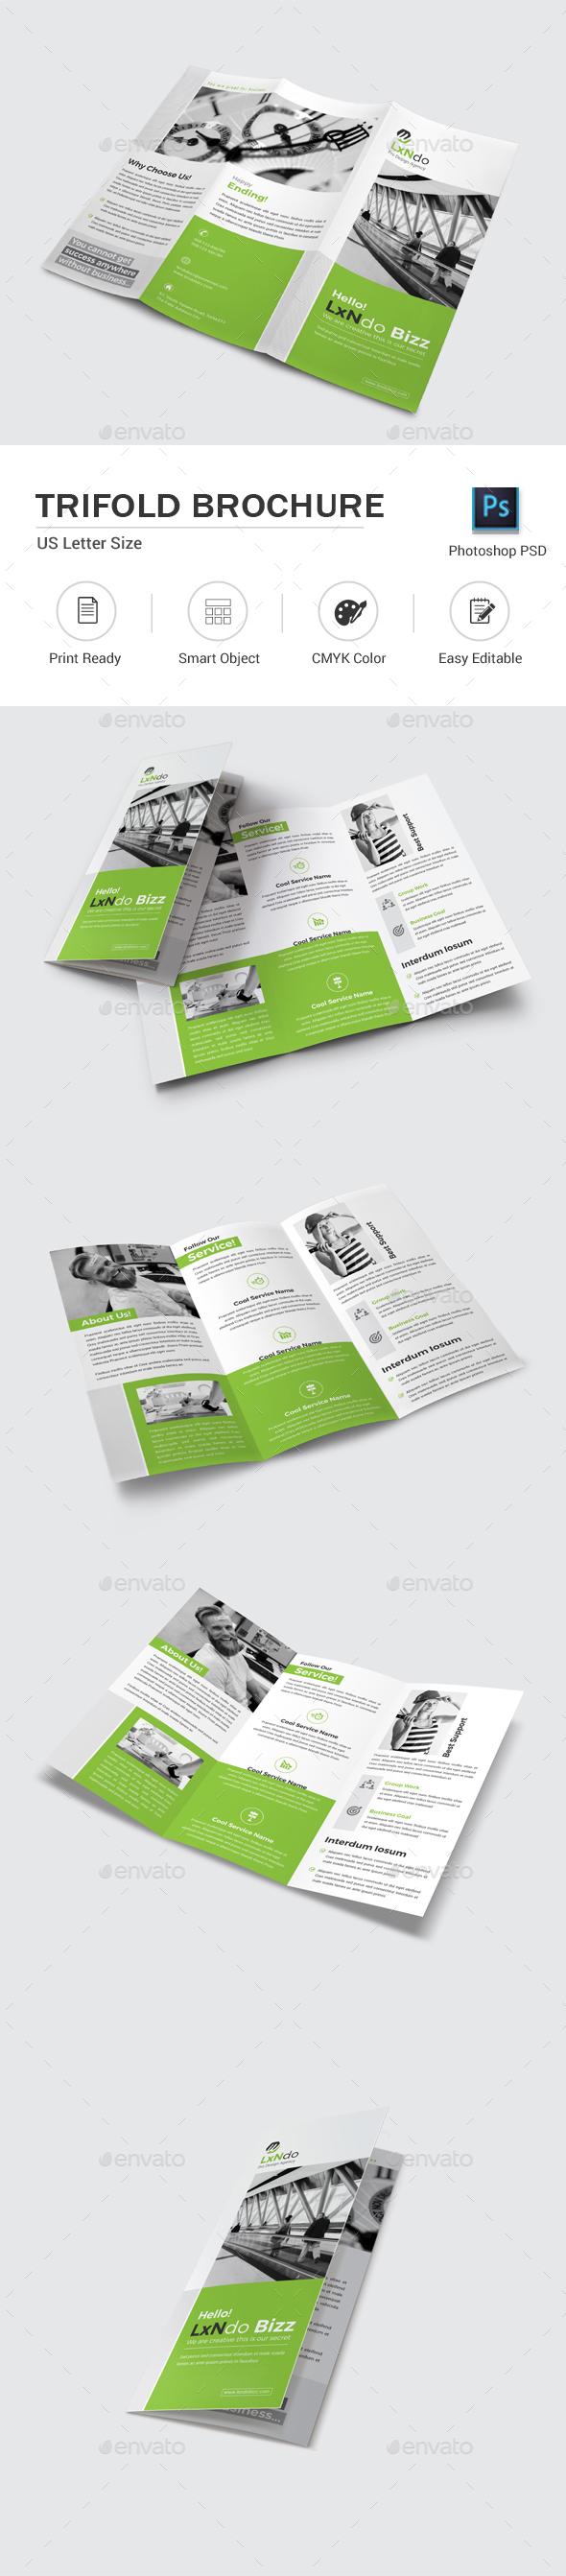 GraphicRiver Trifold Brochure 20935454